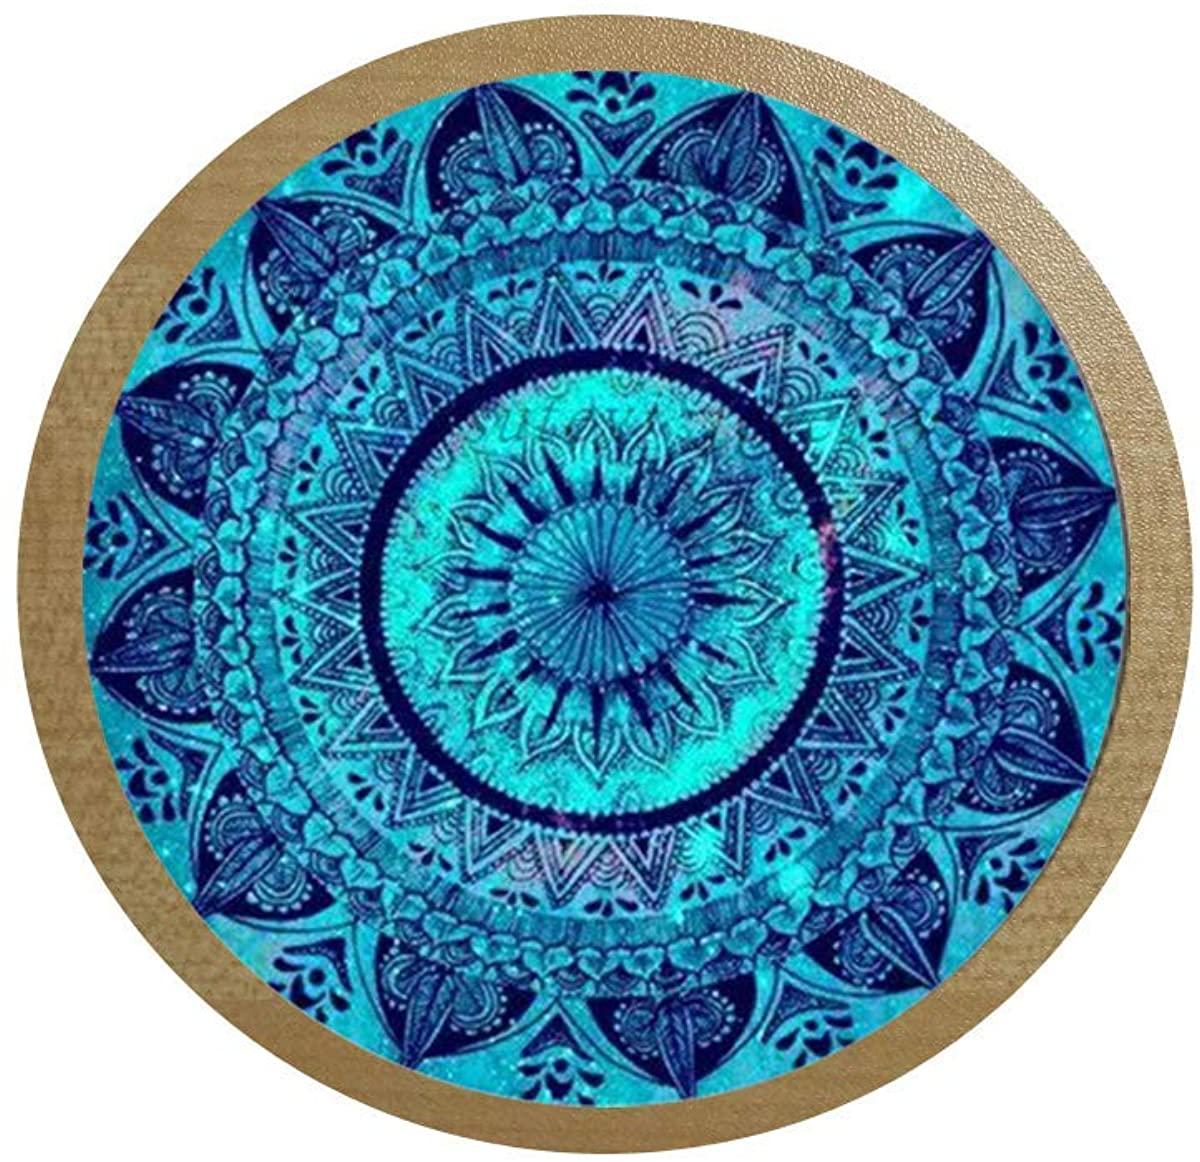 Charms Mandala Statement Necklace Glass cabochon Necklaces & Pendants Zen Yoga Spirital Jewellery Lucky Amulet ice Box Sticker,Blackboard Sticker